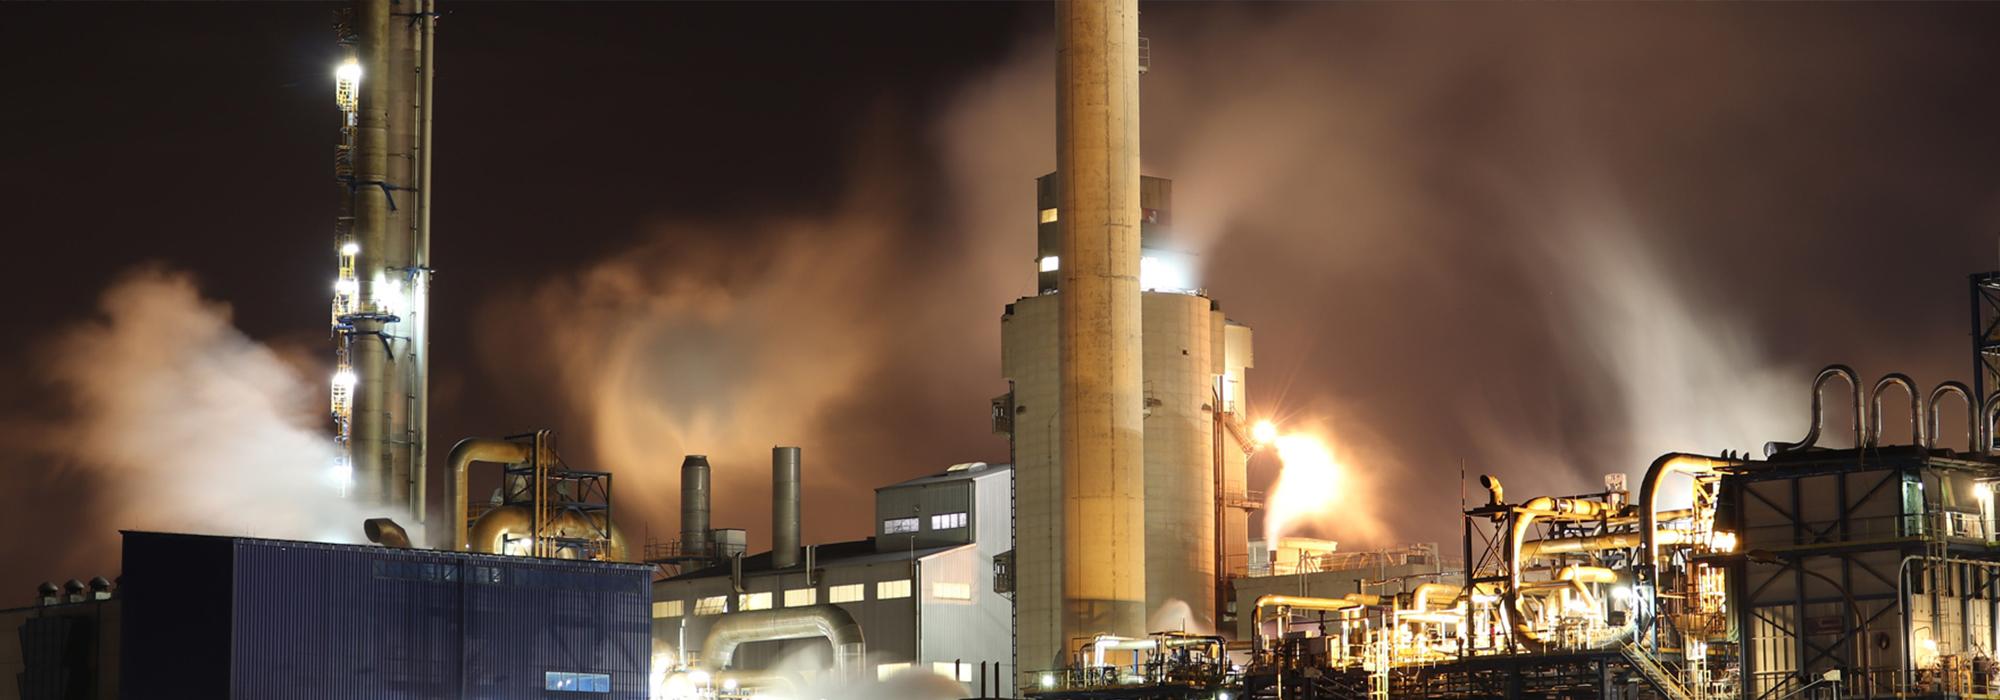 hazardous chemical valves manufacturers